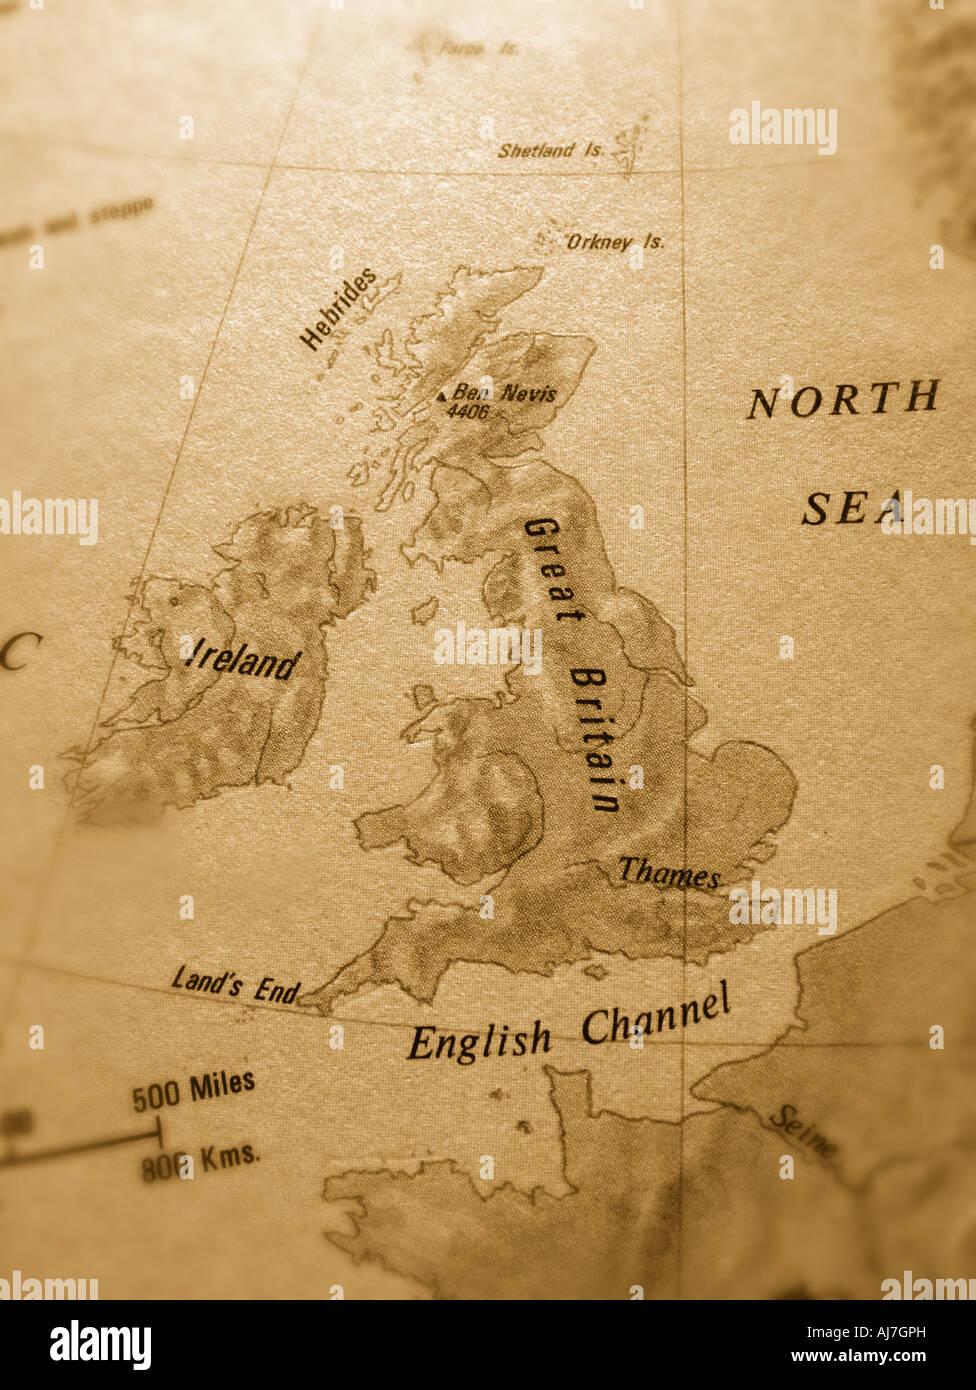 britain map Stock Image Map Britain